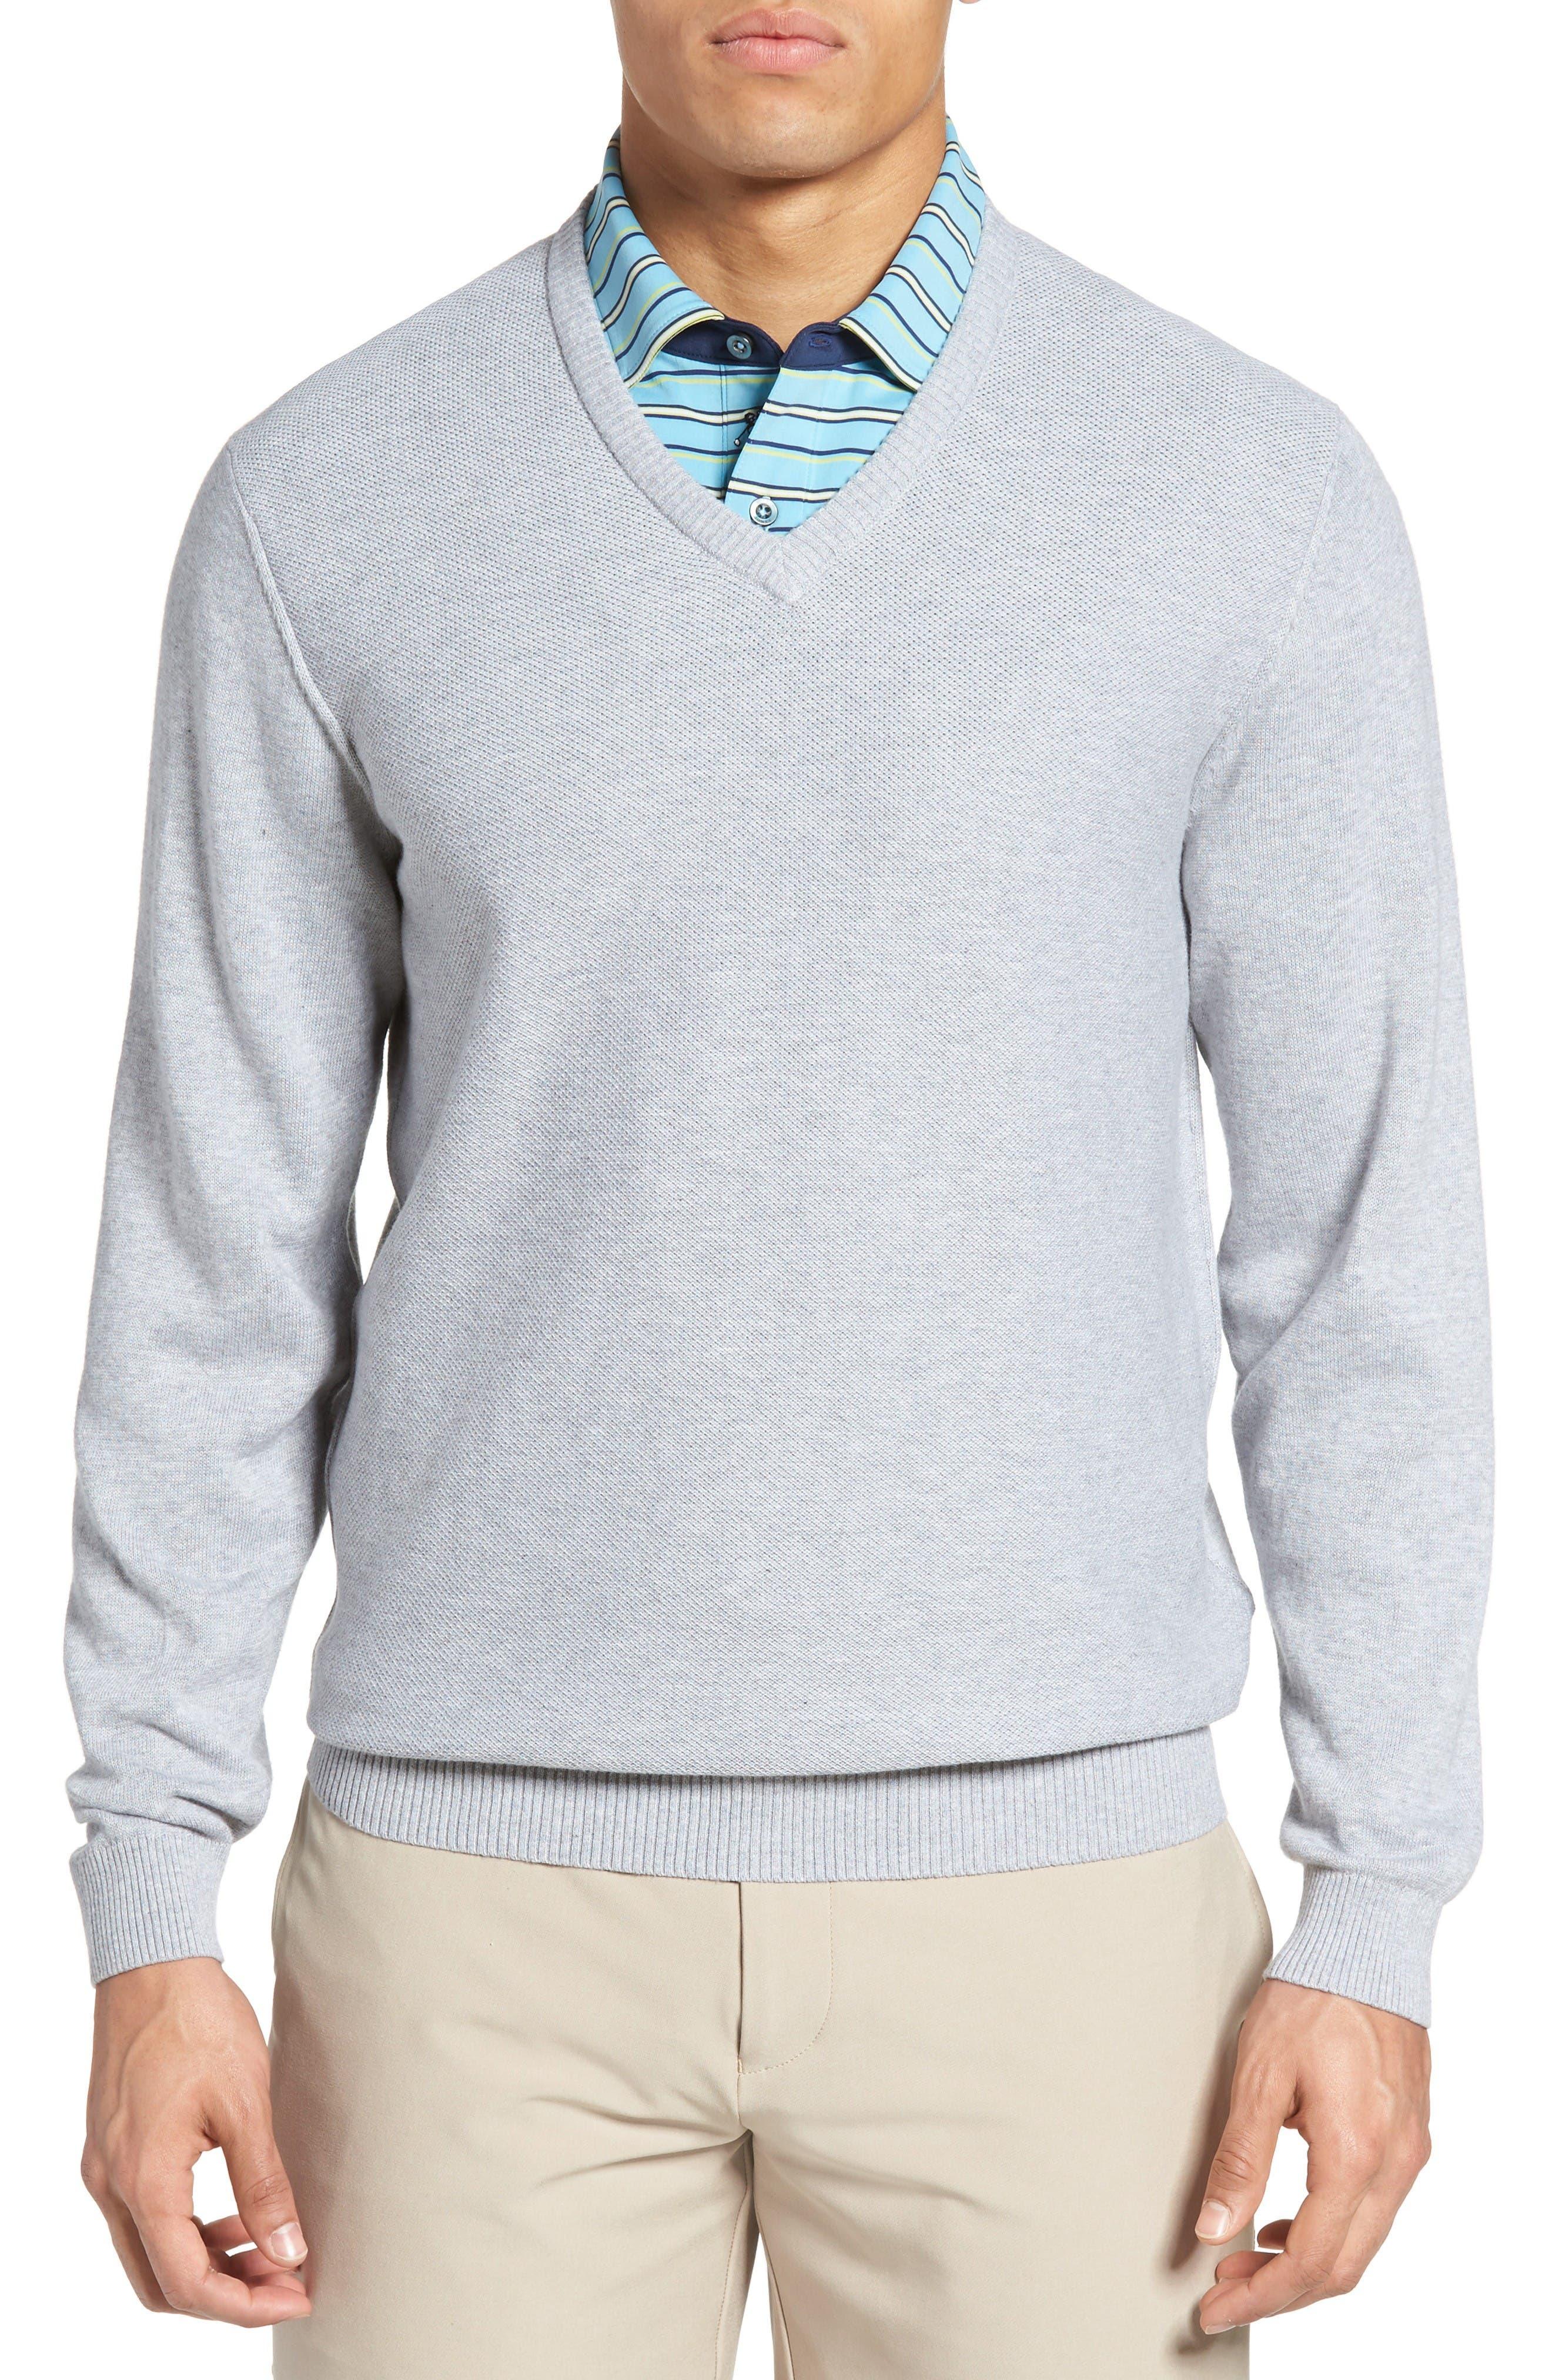 Alternate Image 1 Selected - Bobby Jones Piqué Jersey V-Neck Sweater